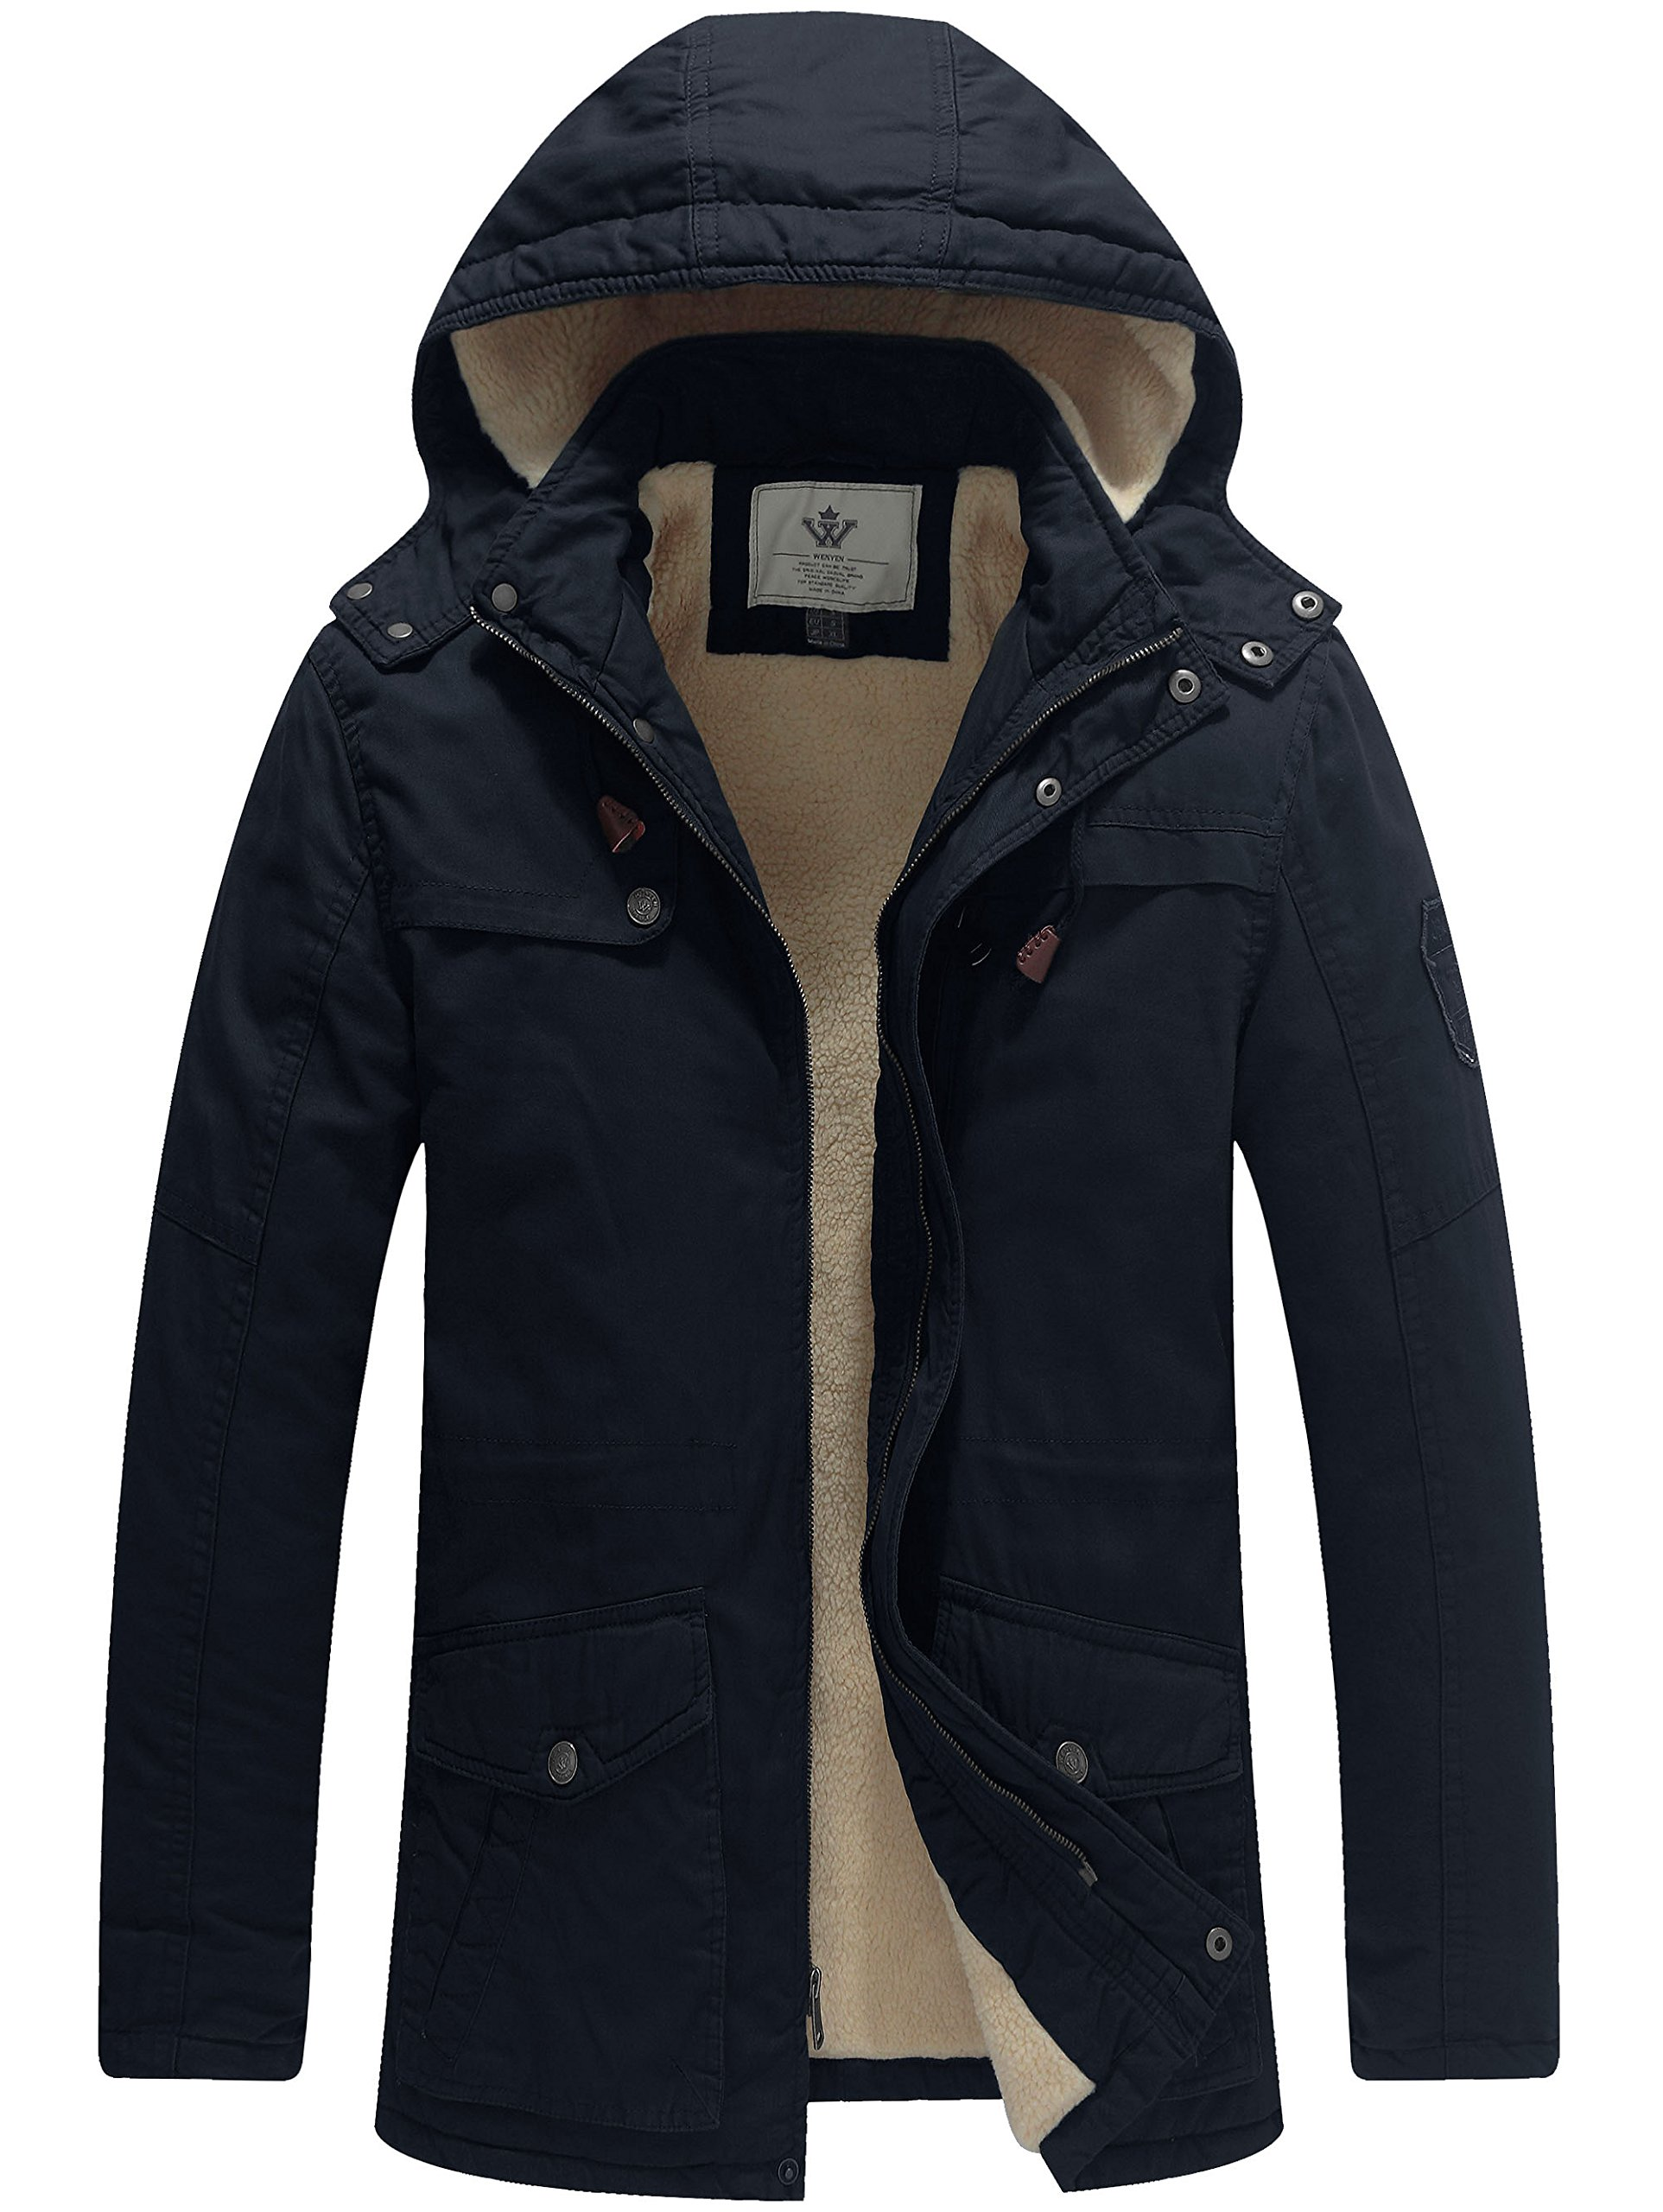 WenVen Men's Winter Washed Cotton Sherpa Lined Parka Jacket(Navy,Large) by WenVen